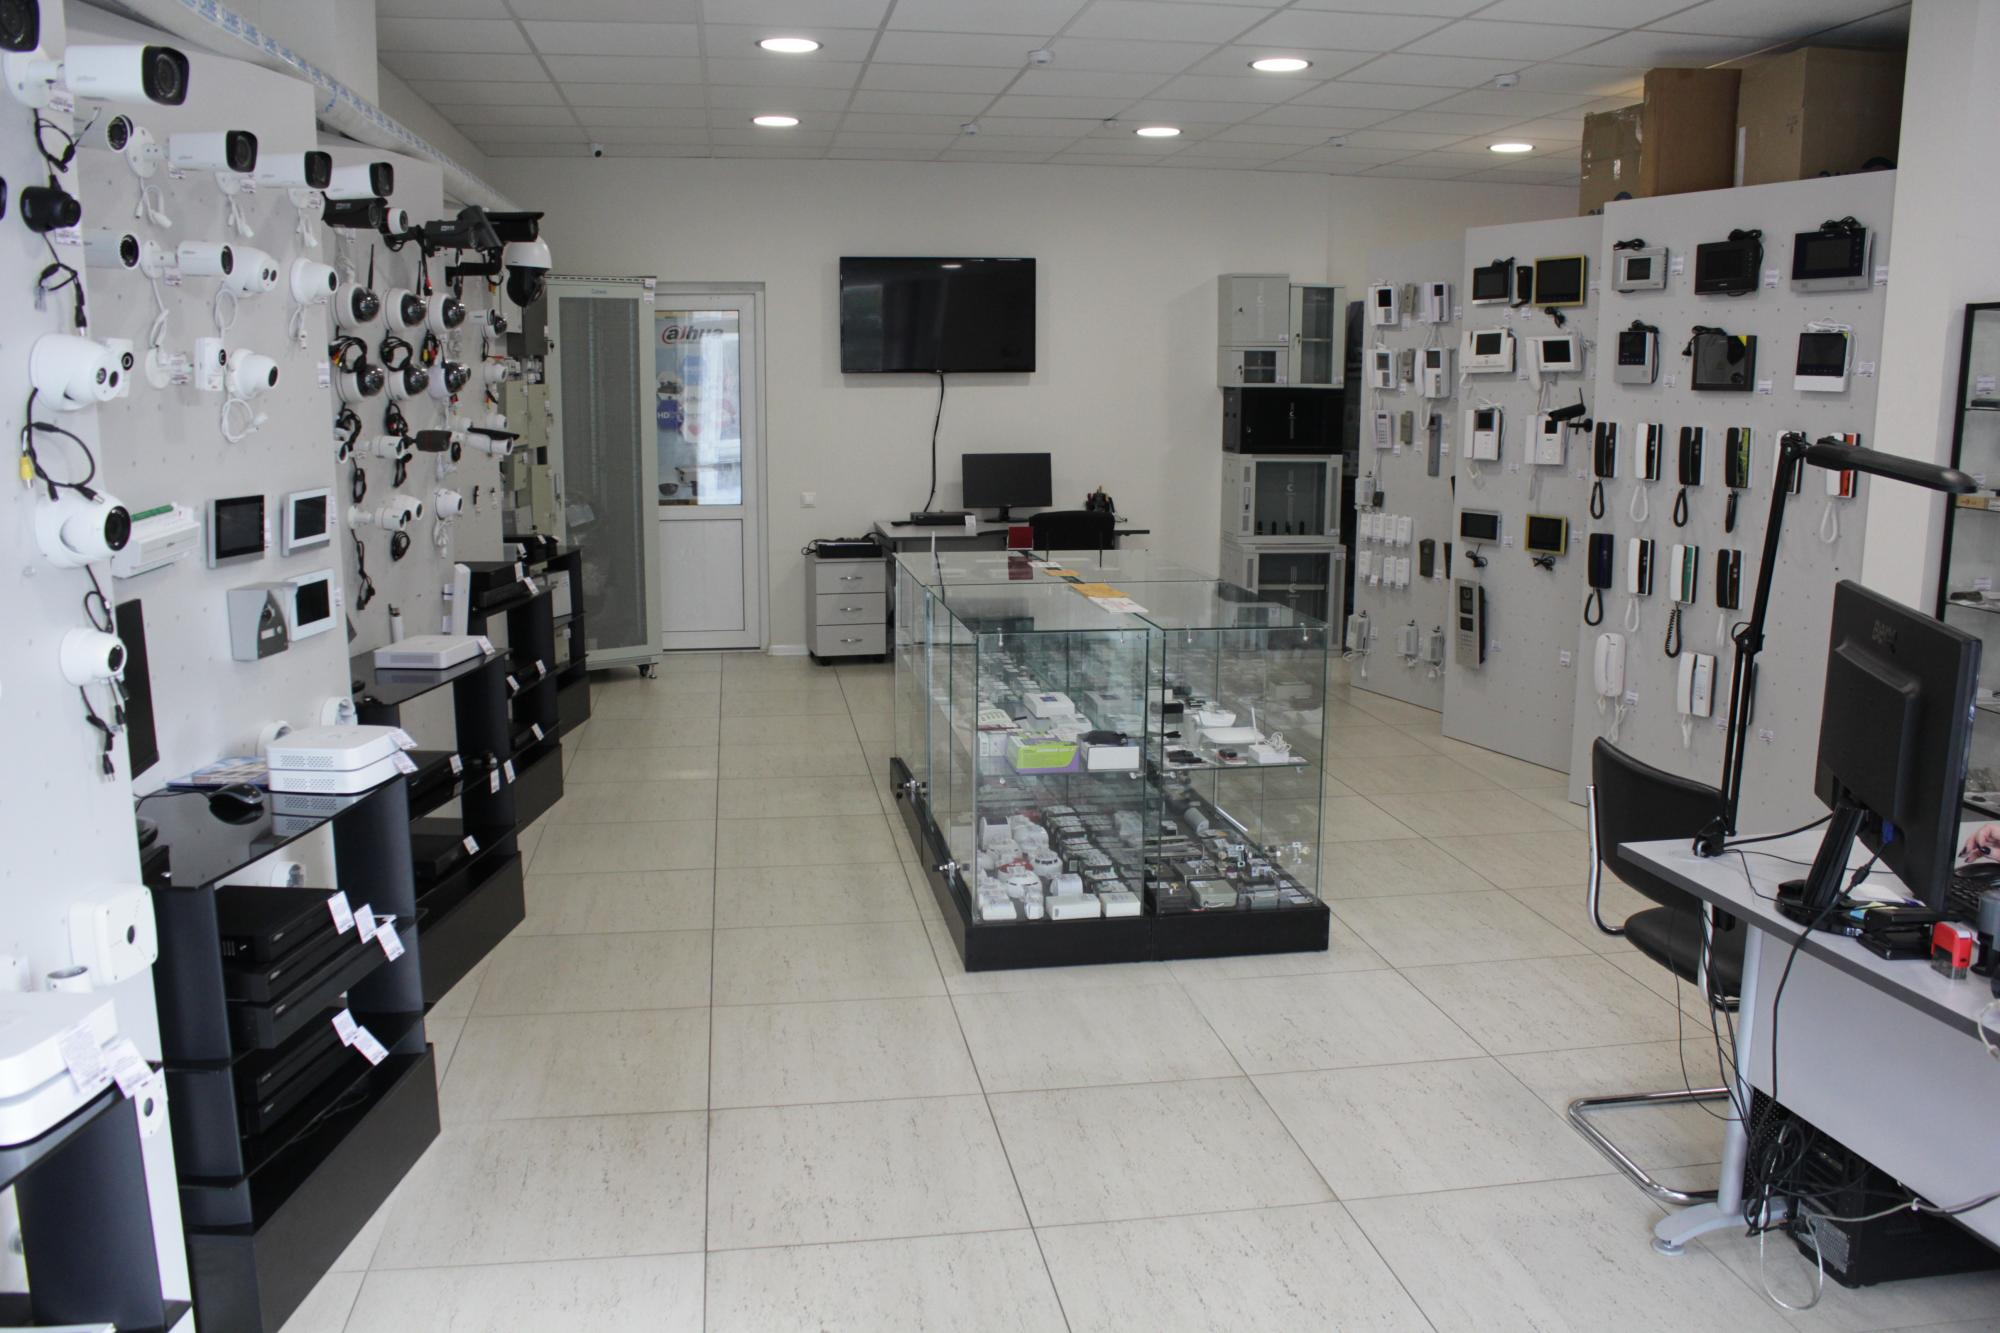 Фото магазина sbv-video.ru - Невинномысск